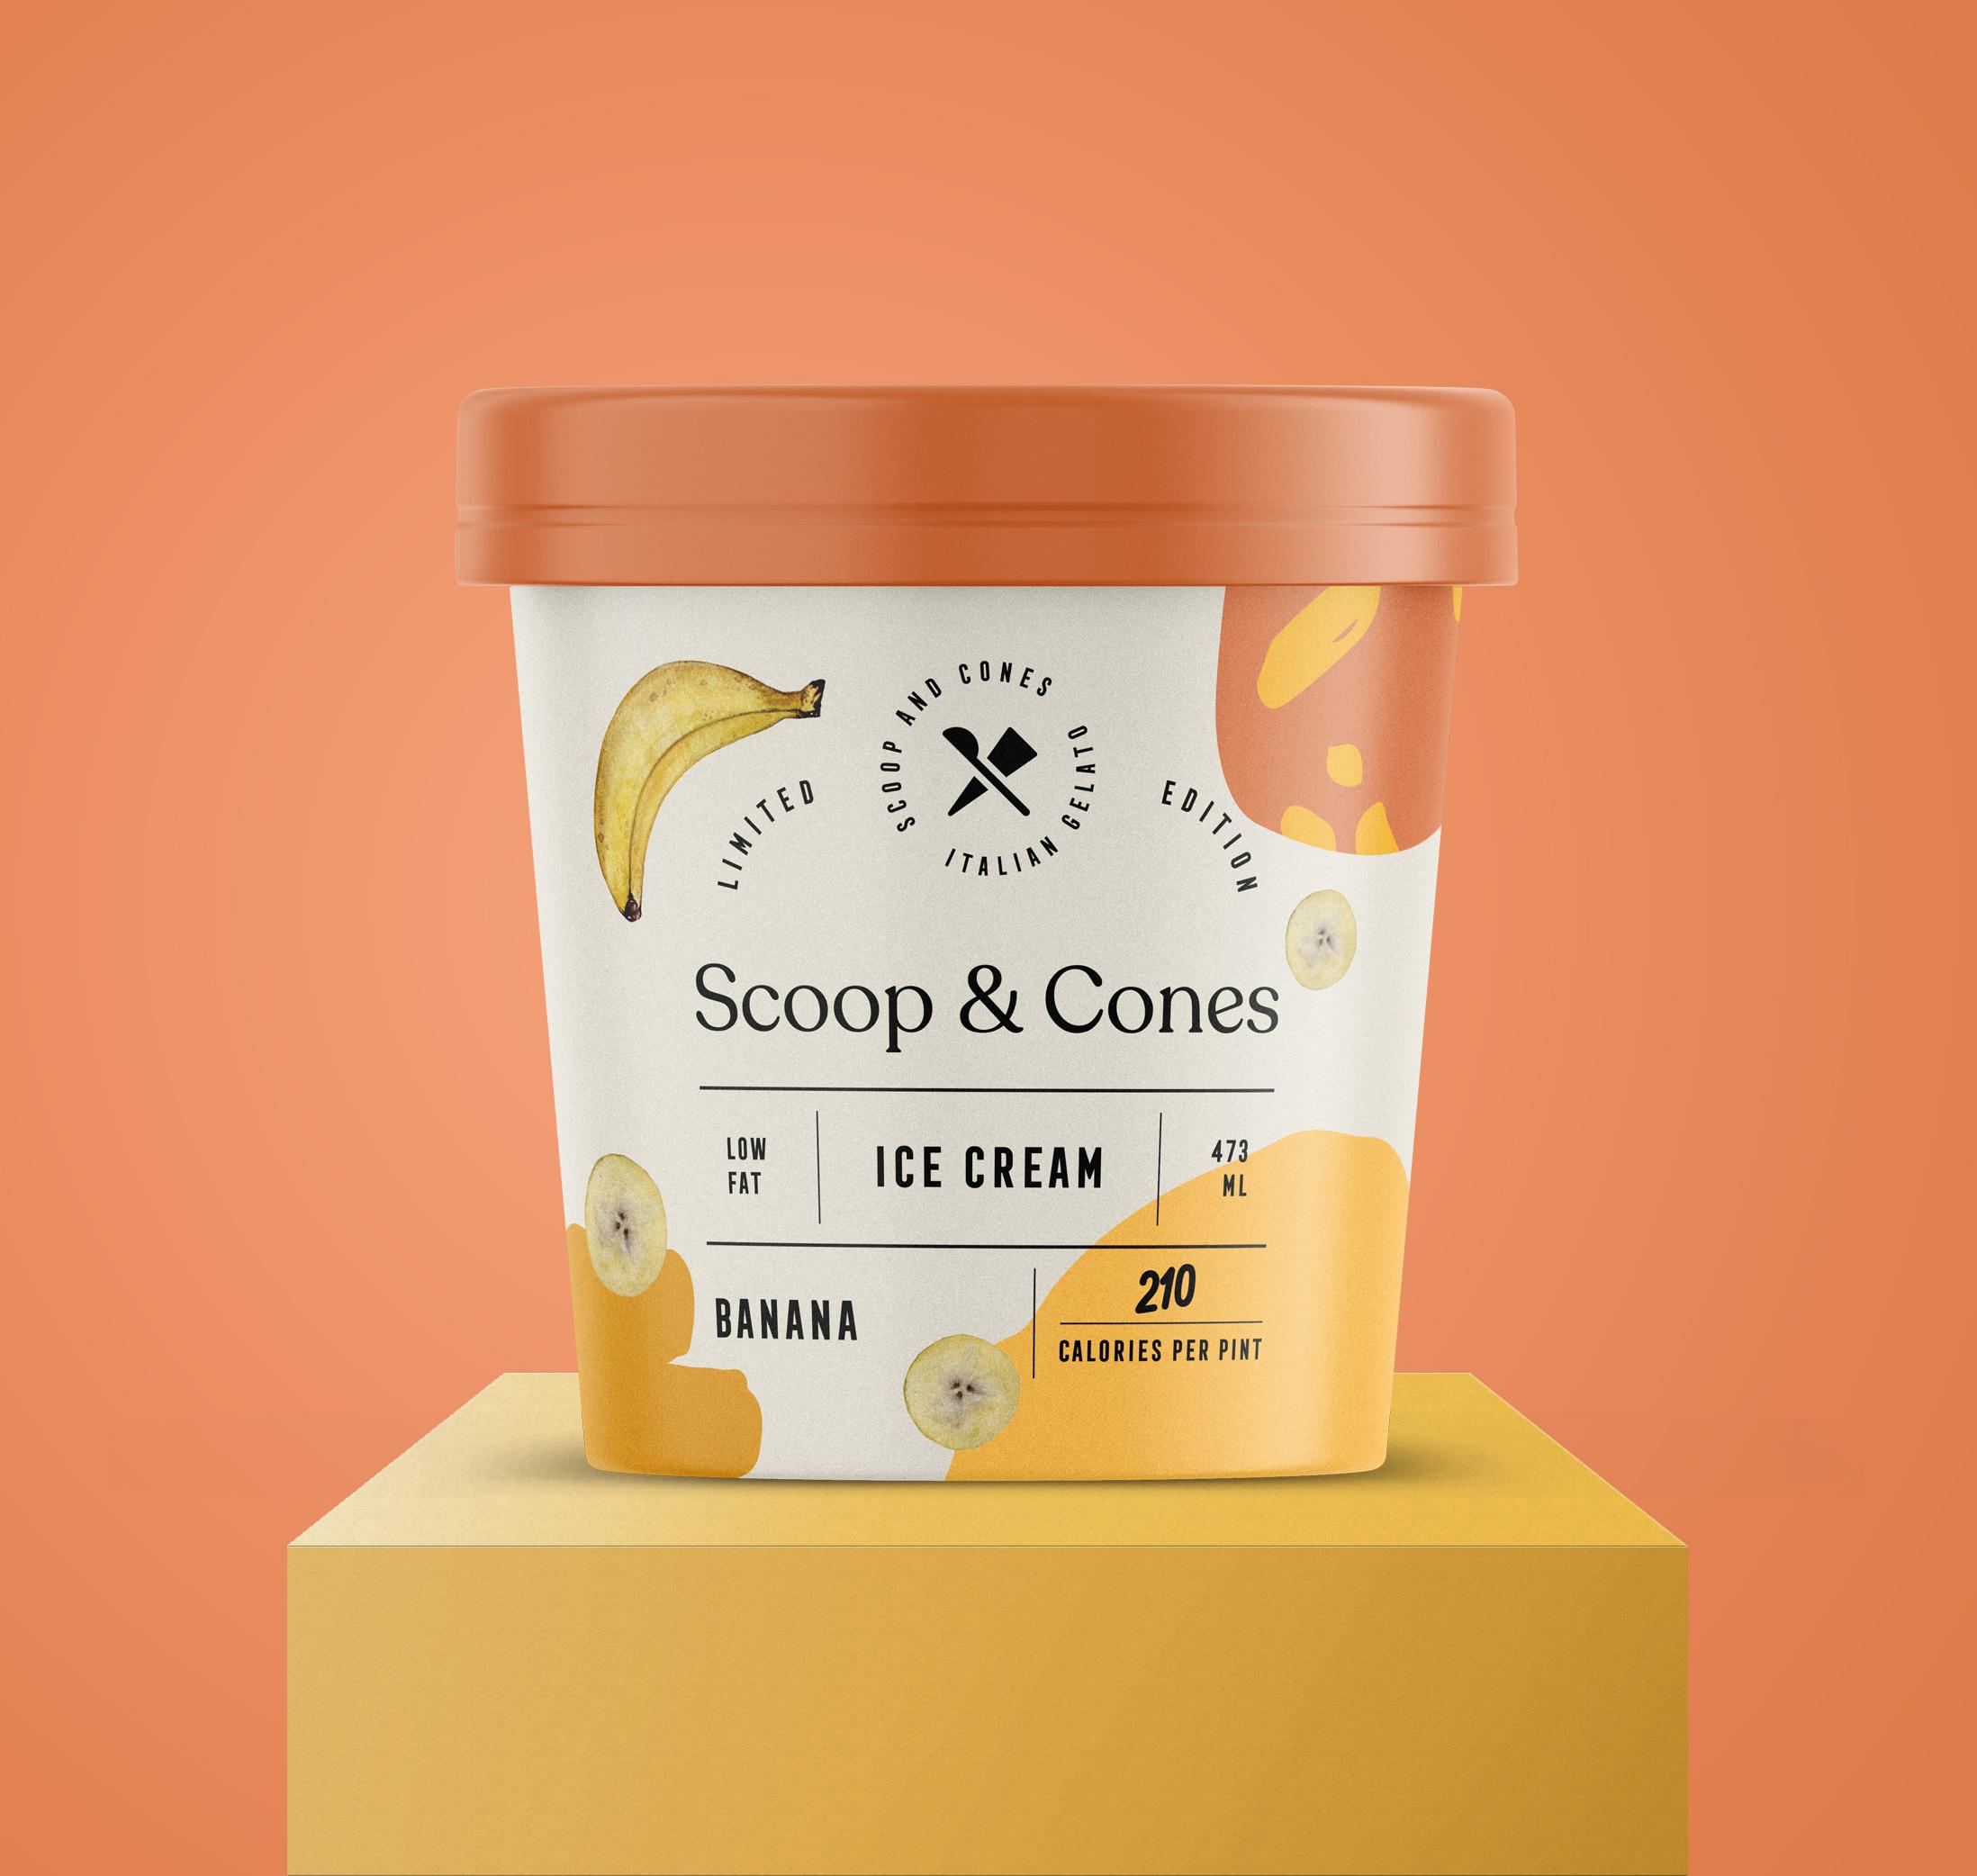 Packaging for Scoop & Cones